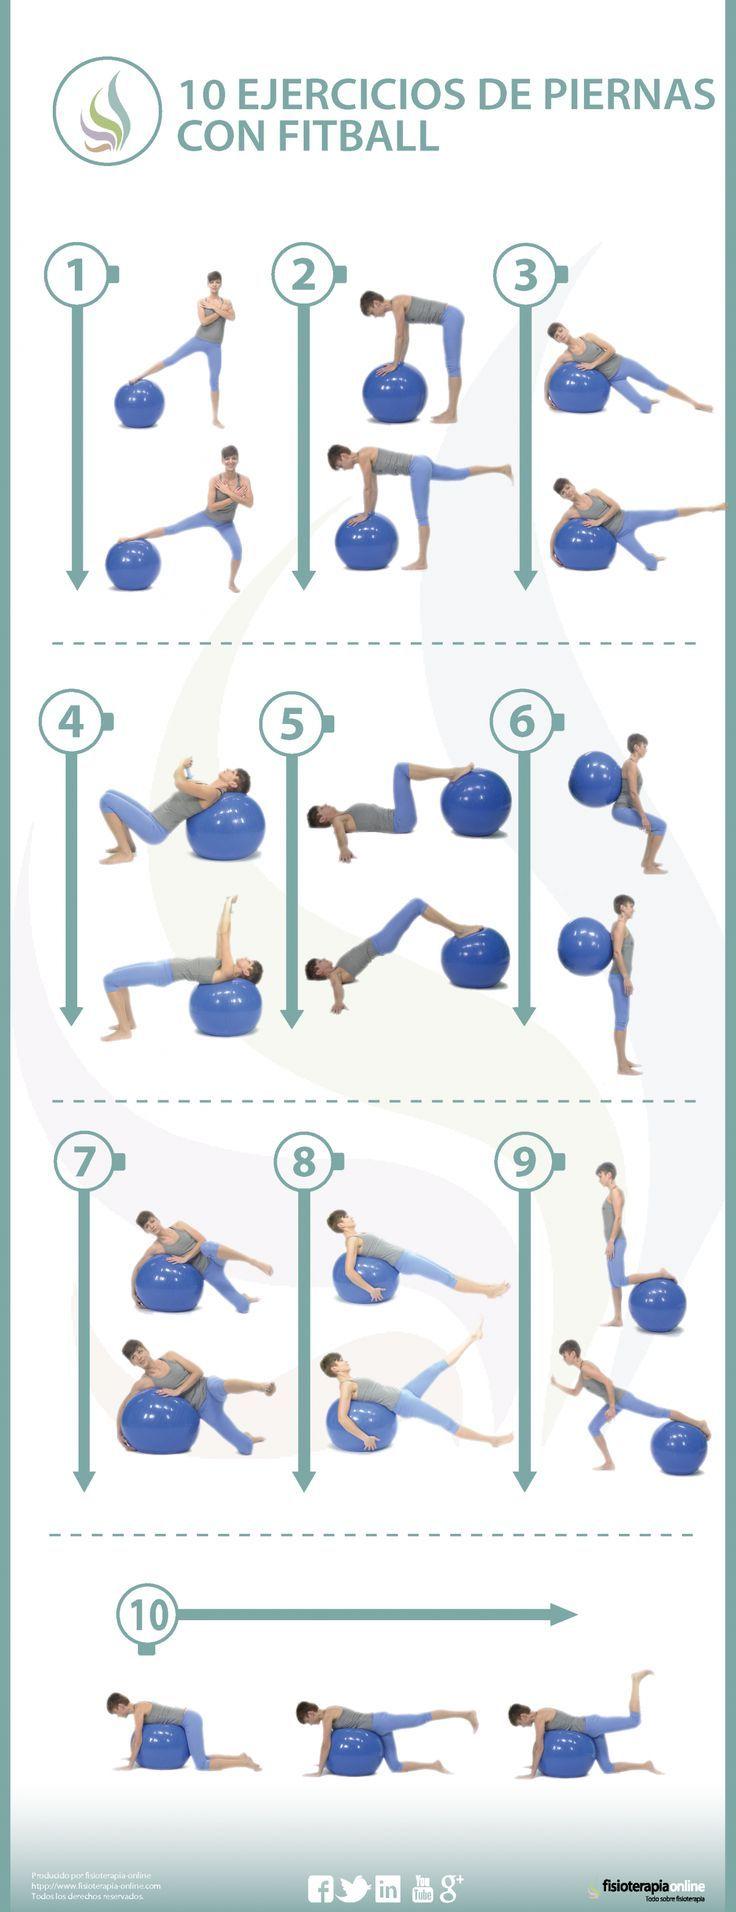 10 ejercicios para tonificar y recuperar tus piernas con fitball - Pinset #pilatesworkoutroutine